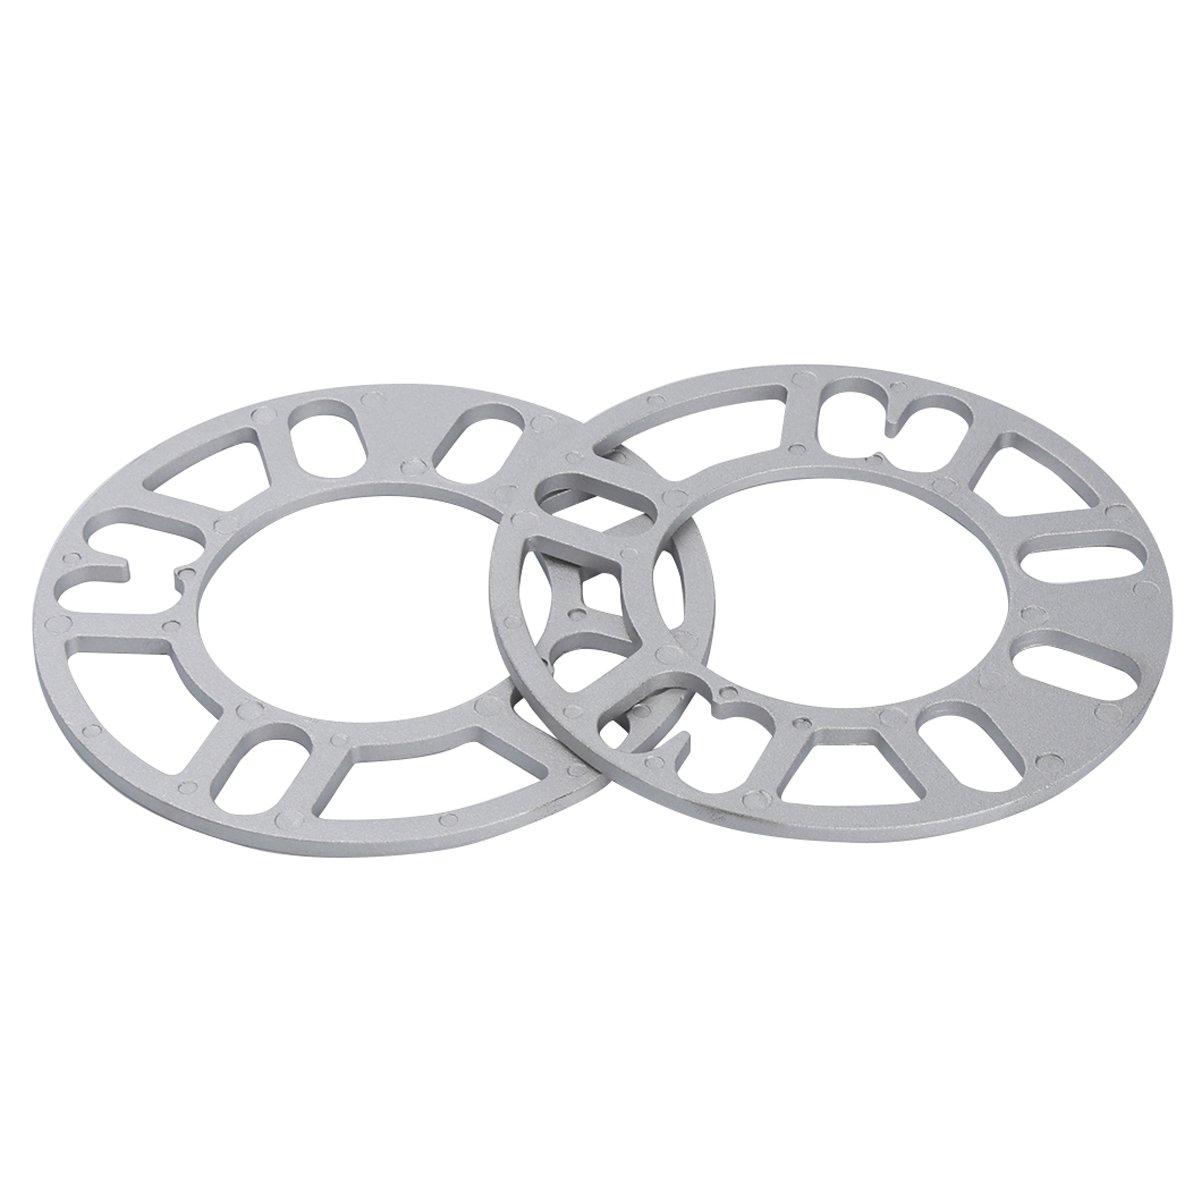 5mm Universal Wheel Spacers for 4 and 5 Lug, Hub 78mm 2pc Dynofit 4x4.5 5x4.5 WHEEL SPACERS for 98-12 PCD, Jeep Nissan Honda Toyota Lexus Acura Infiniti 350z 370z G35 37 Wrangler XJ JK WJ Civic